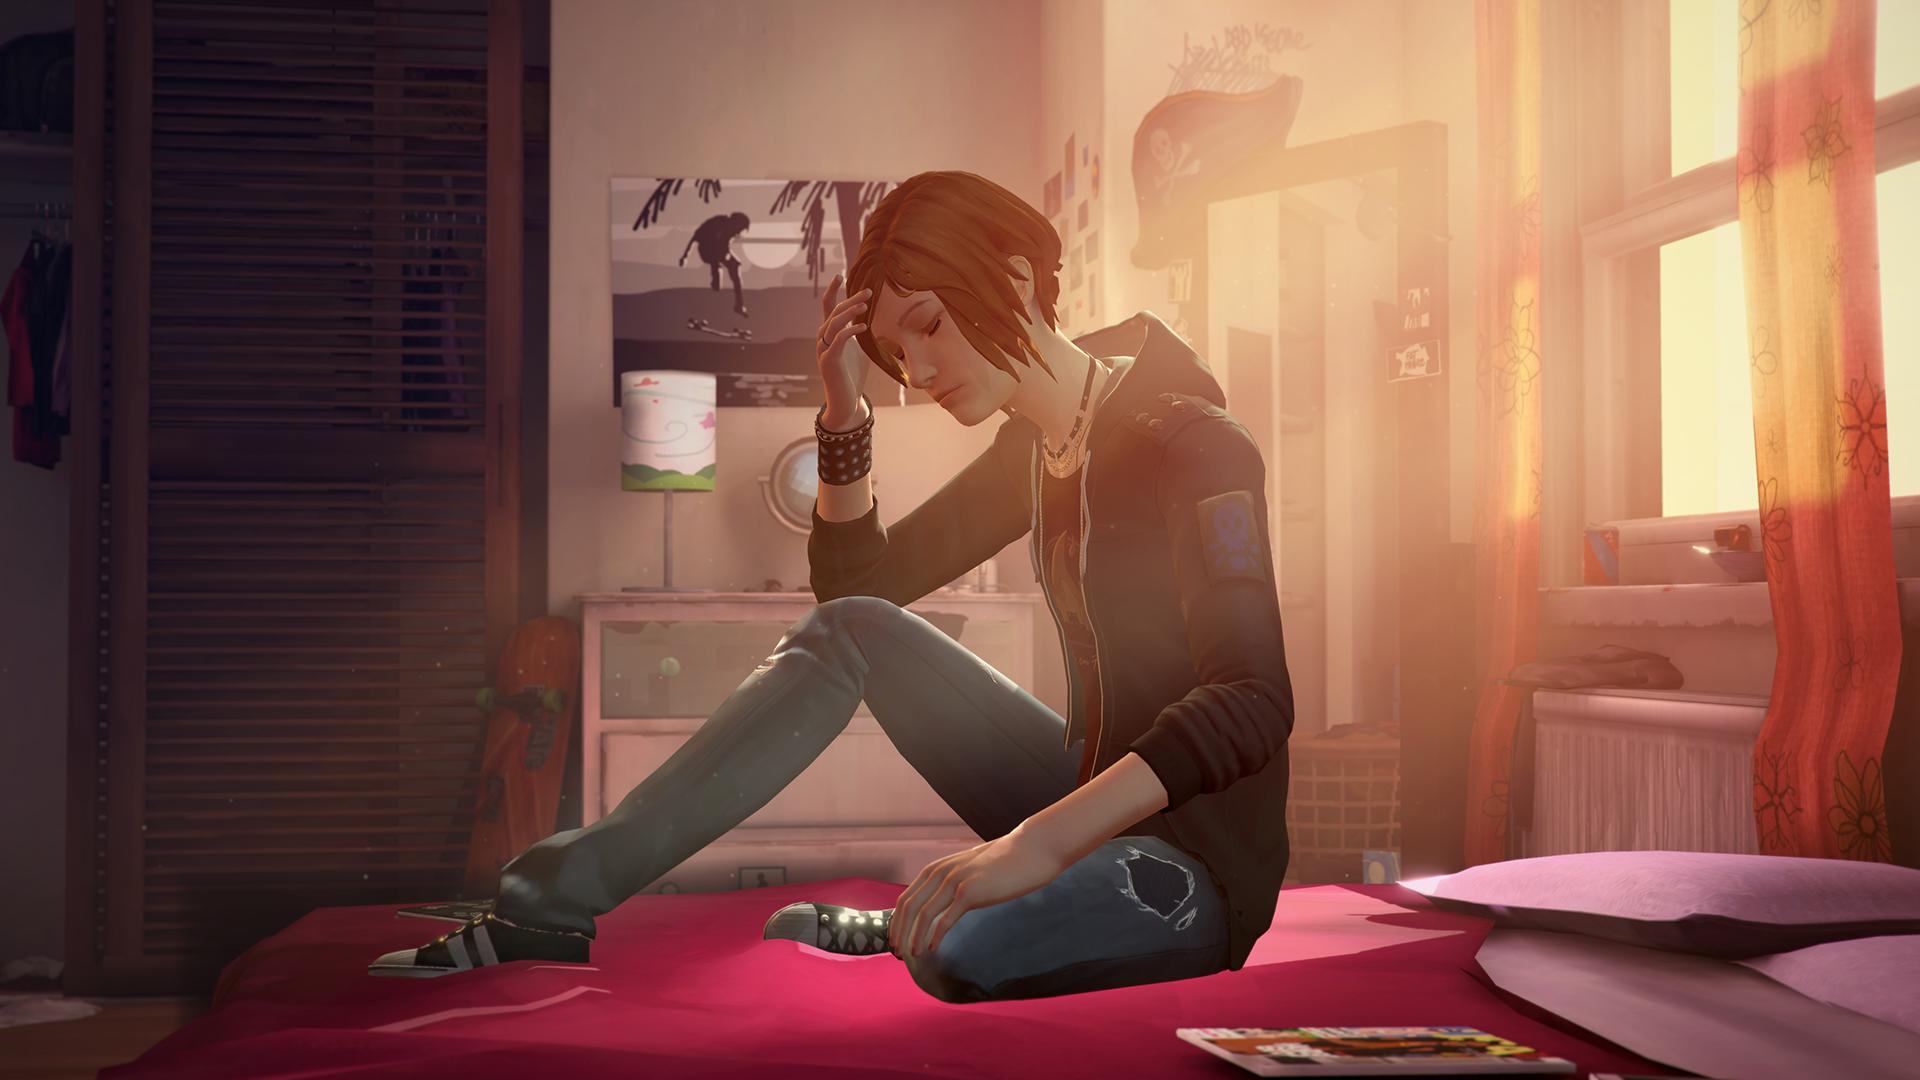 Life is Strange: Before the Storm از پلیاستیشن ۴ پرو و ایکسباکس وان ایکس پشتیبانی خواهد کرد